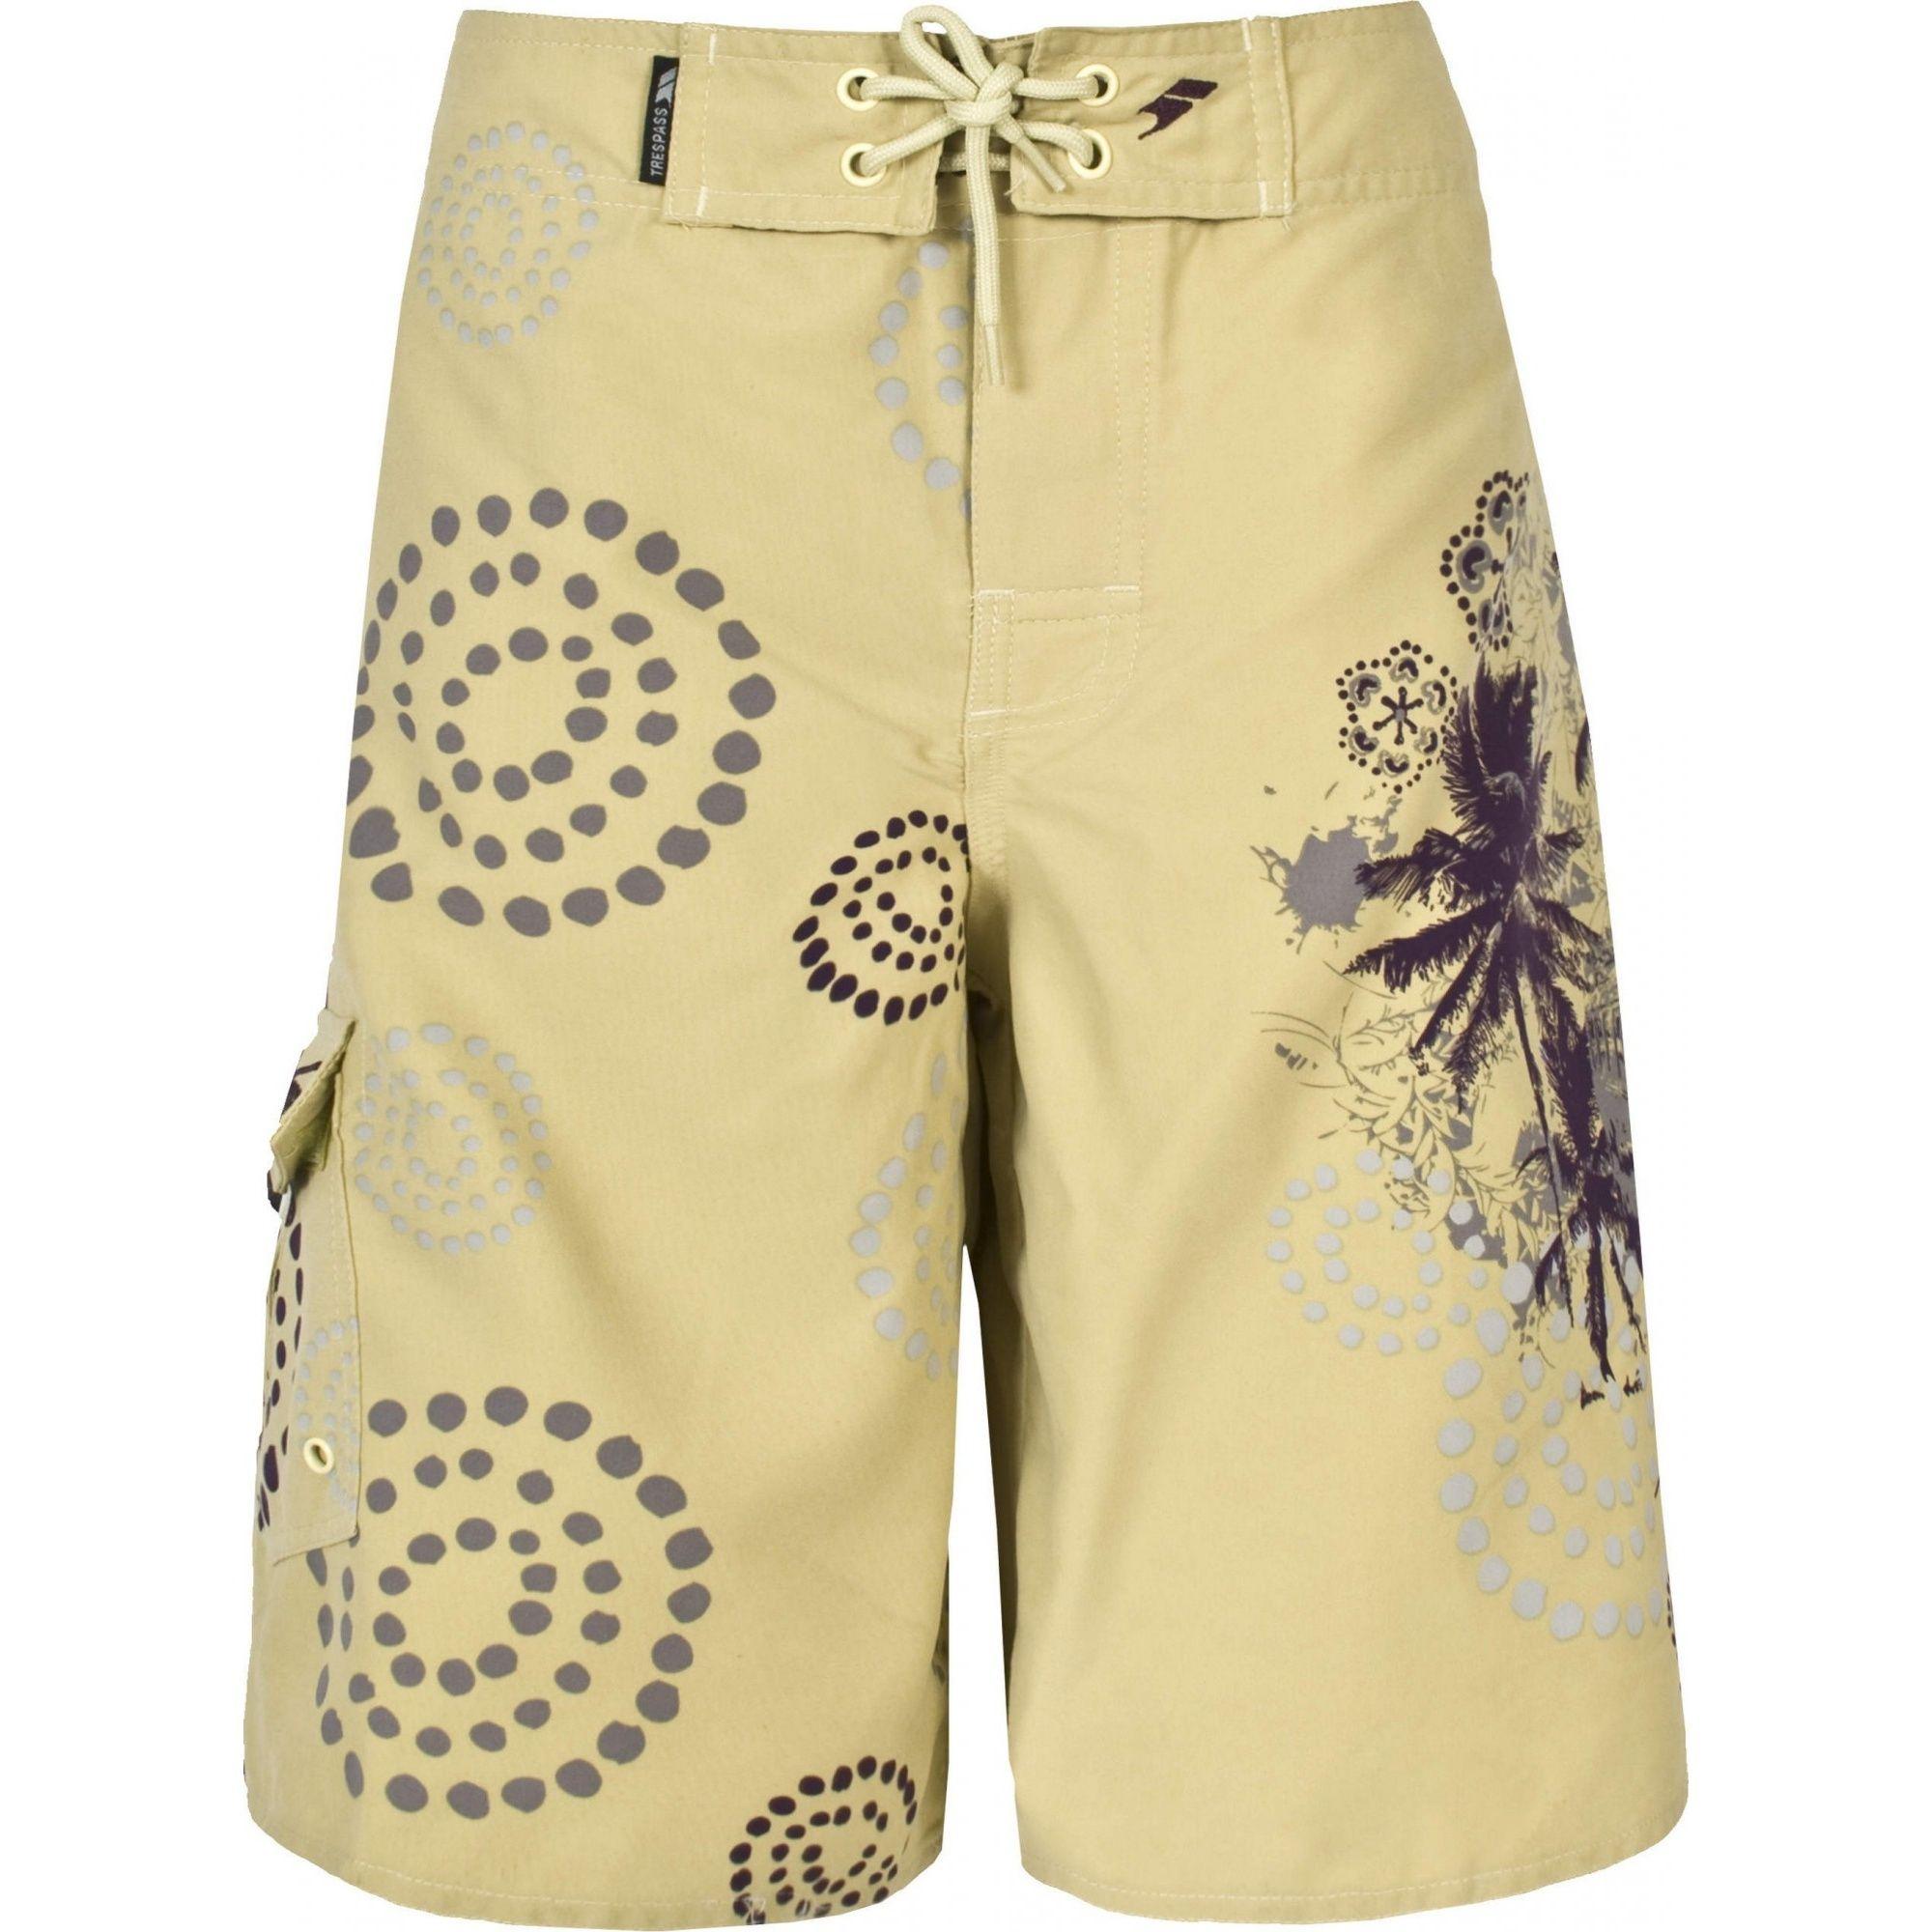 Trespass Mens Hang Five Swimming Shorts/Trunks